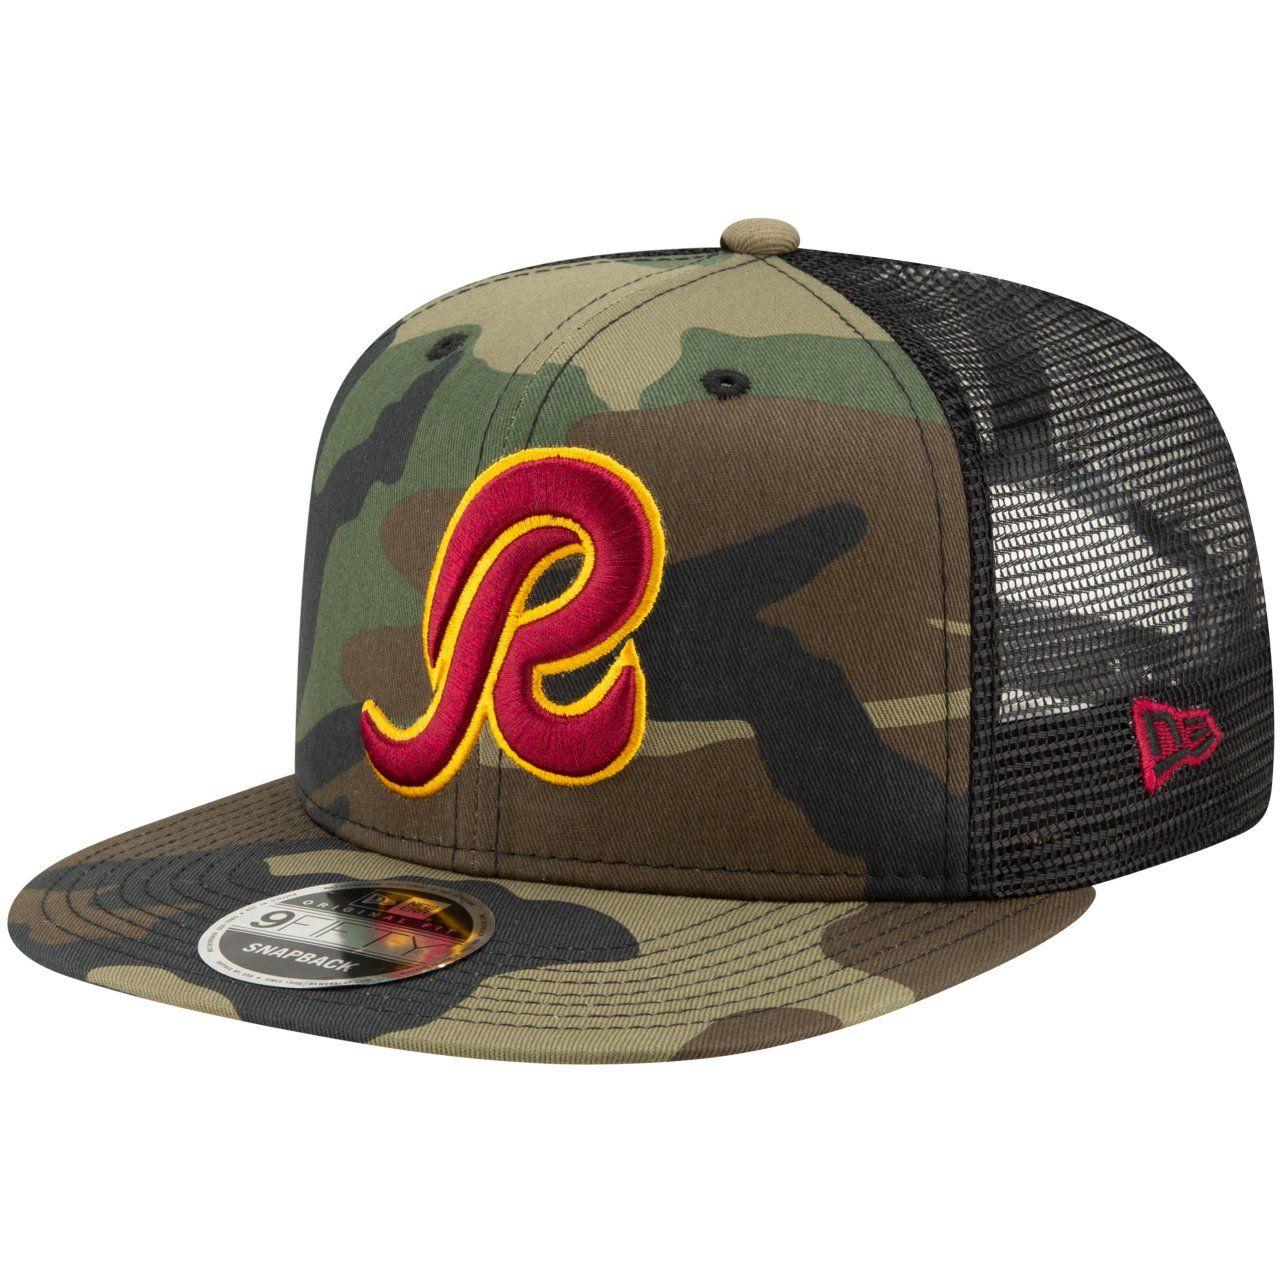 amfoo - Throwback Washington Redskins Mesh 9Fifty Snapback Cap wood